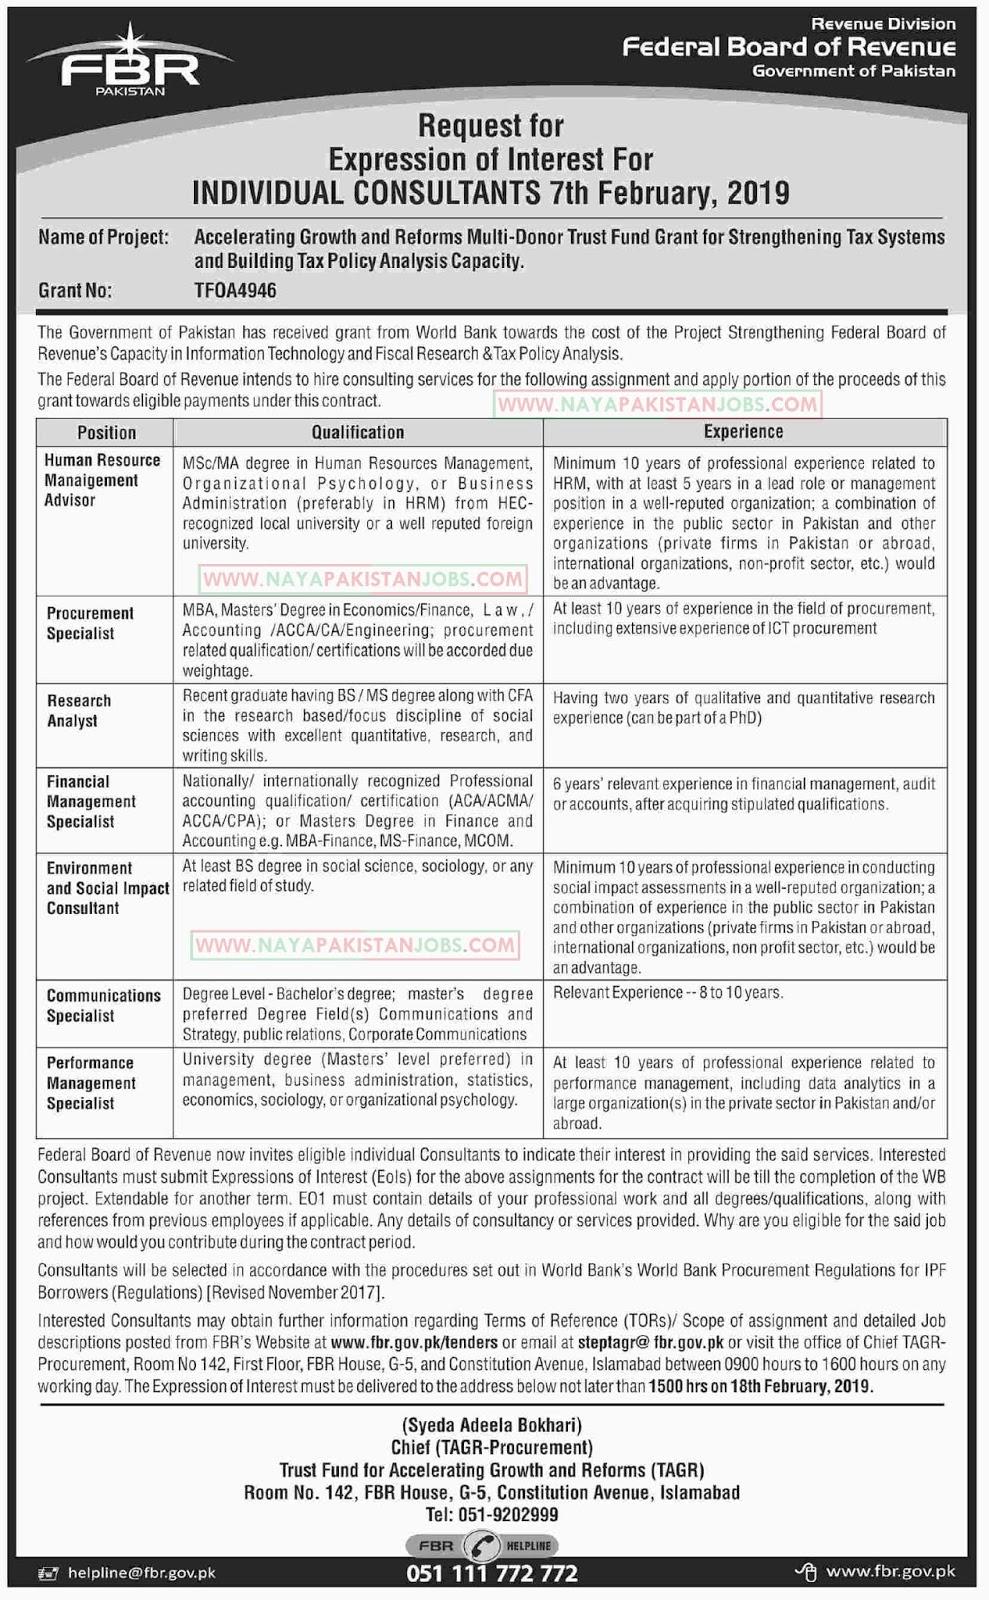 FBR Jobs, FBR Jobs Govt of Pakistan , FBR Jobs 2019 Feb | Federal Board Of Revenue Jobs